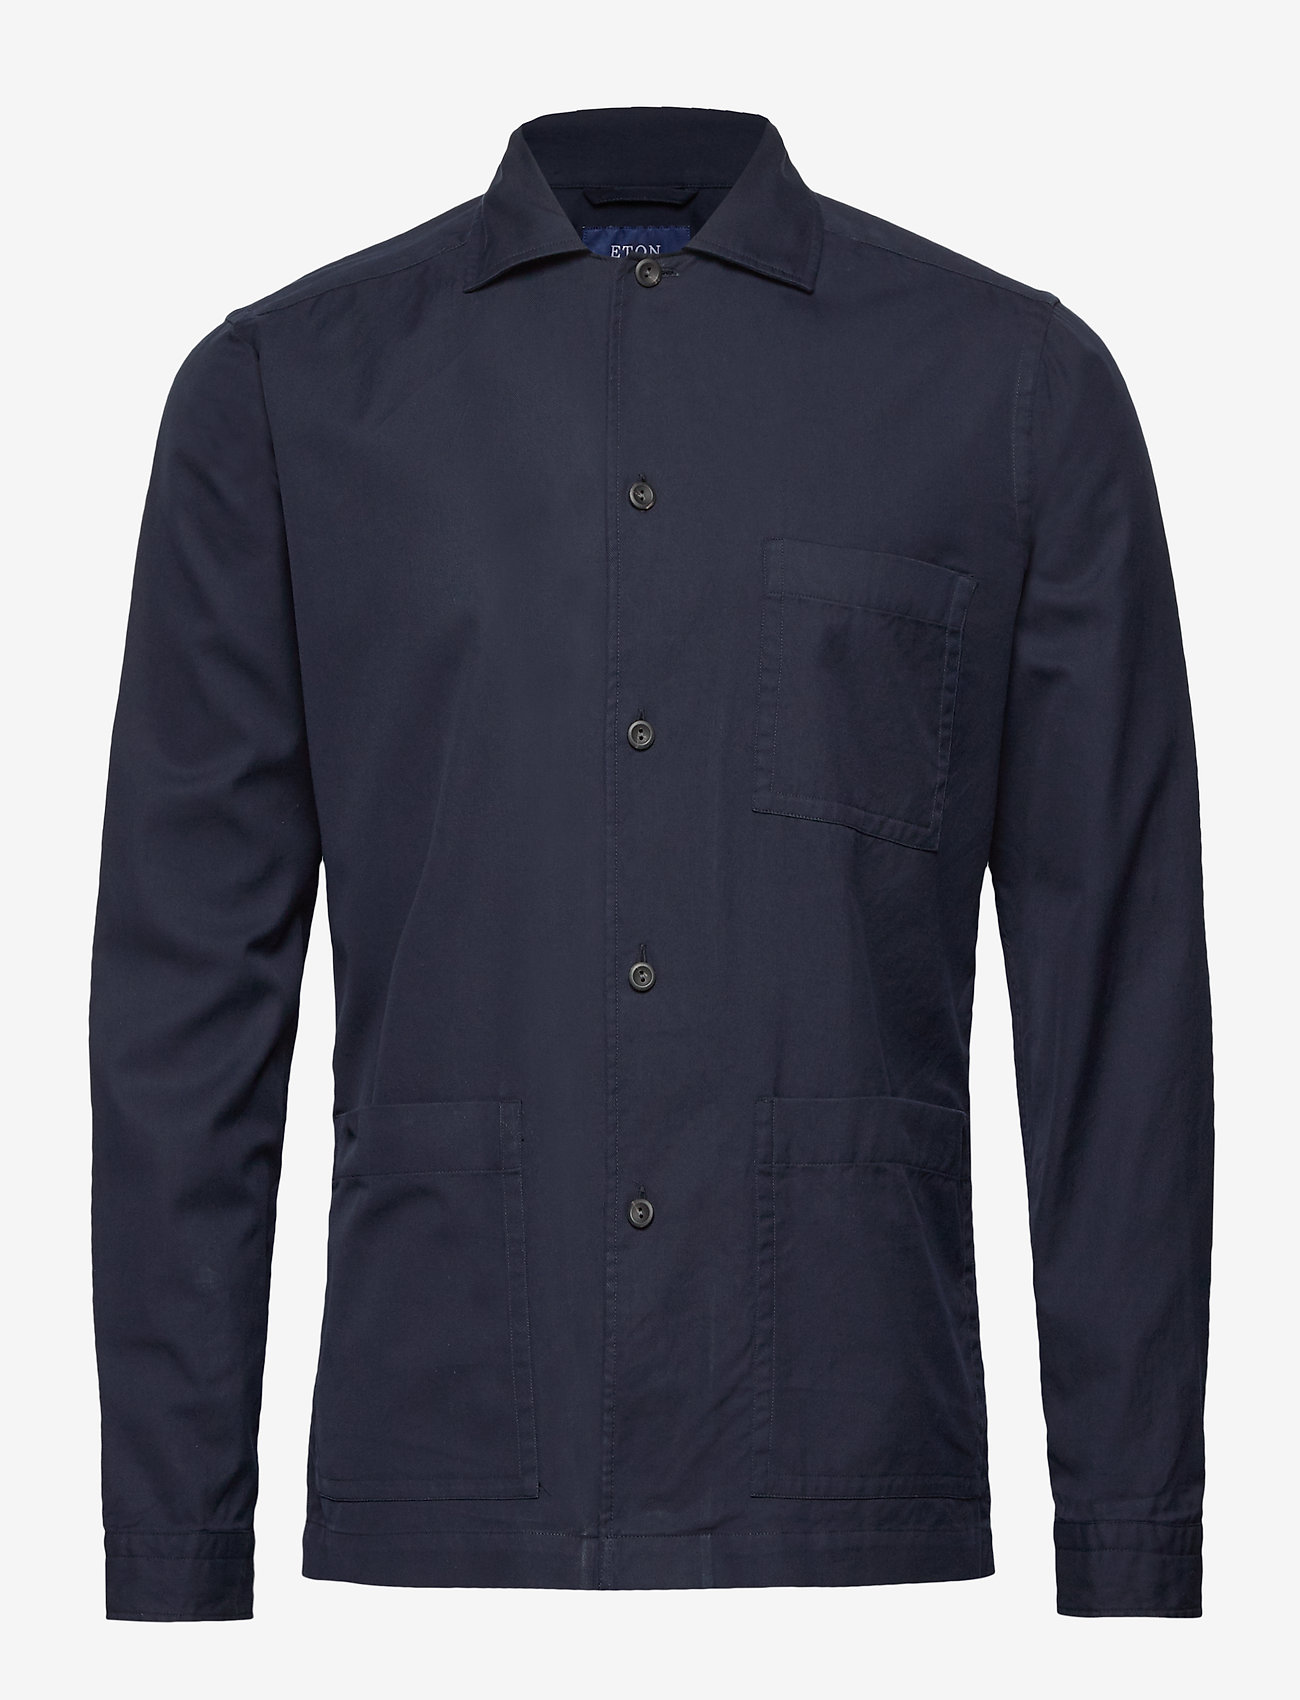 Särskild rabatt3-pocket Overshirt Blue 1199.40 Eton 2KR0Z OhxoI